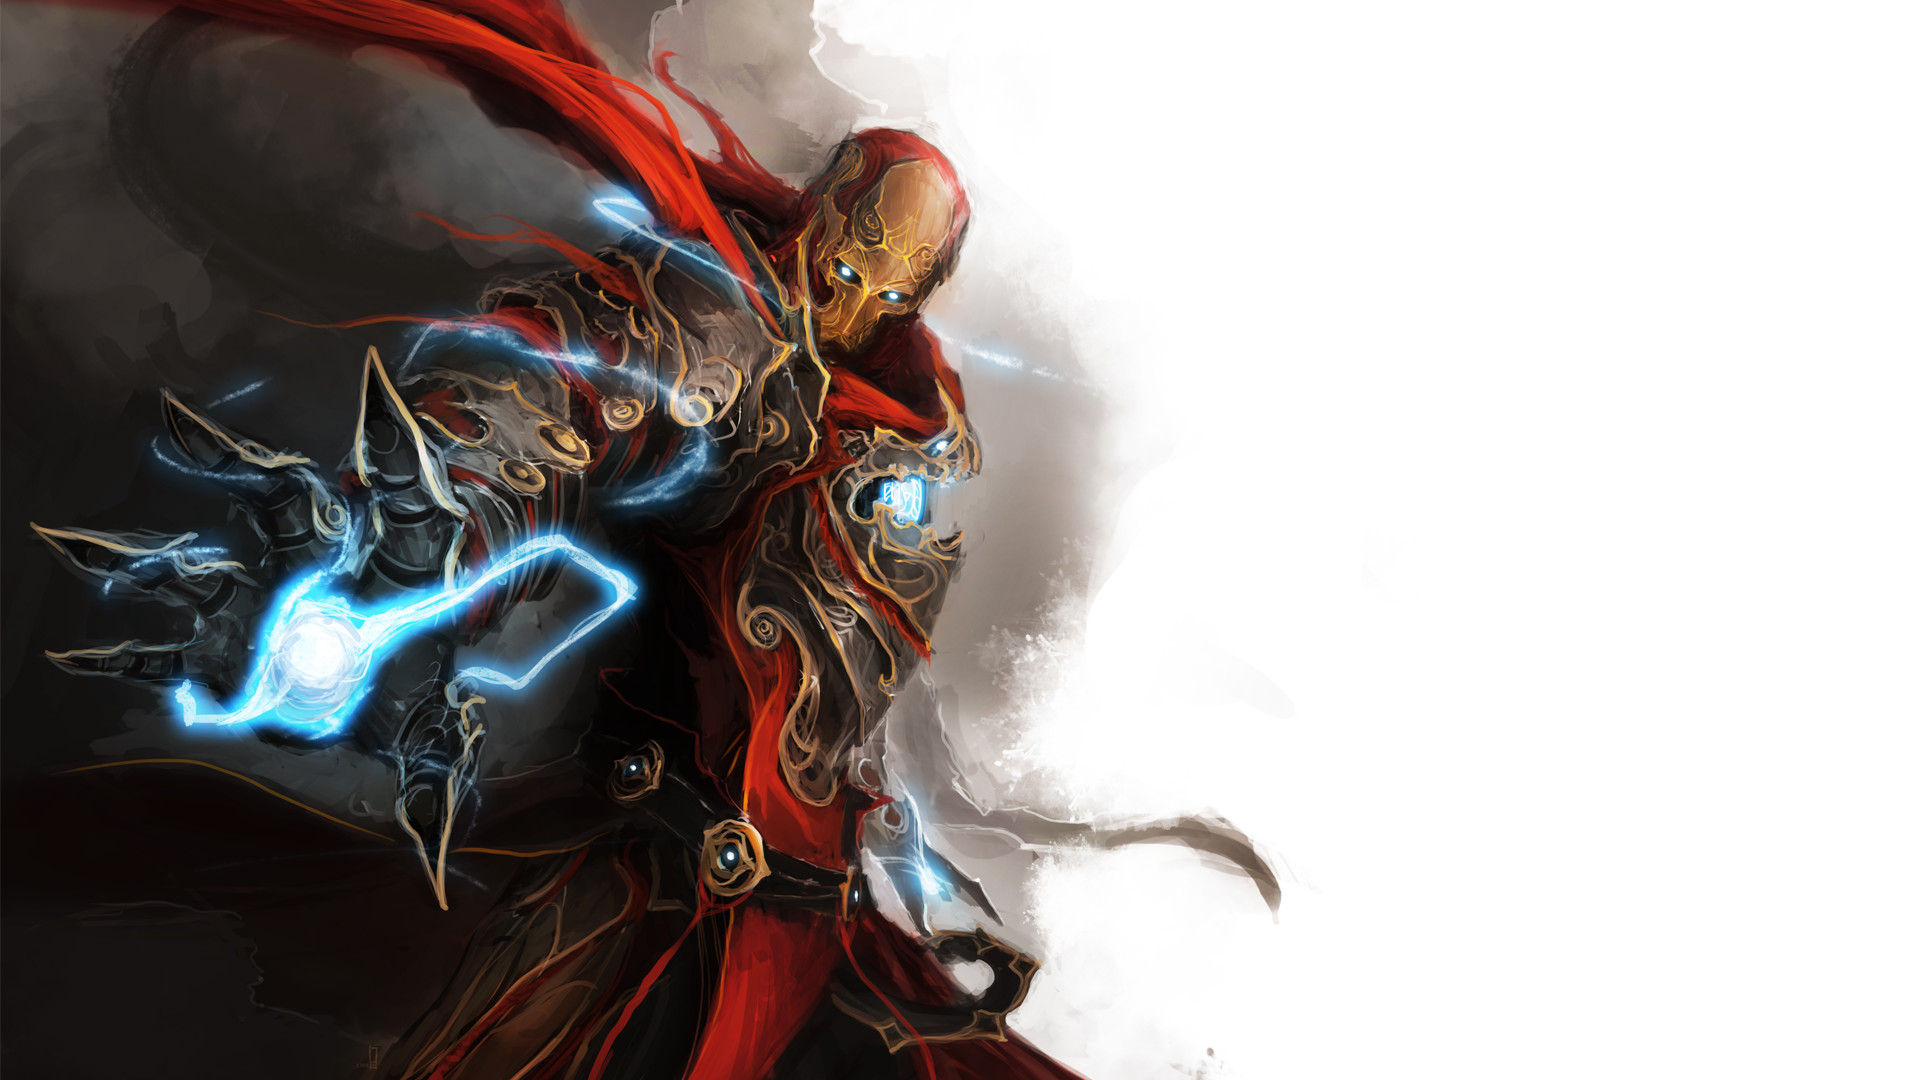 Man Artistic Iron Medieval iron man HD Wallpapers, Desktop .